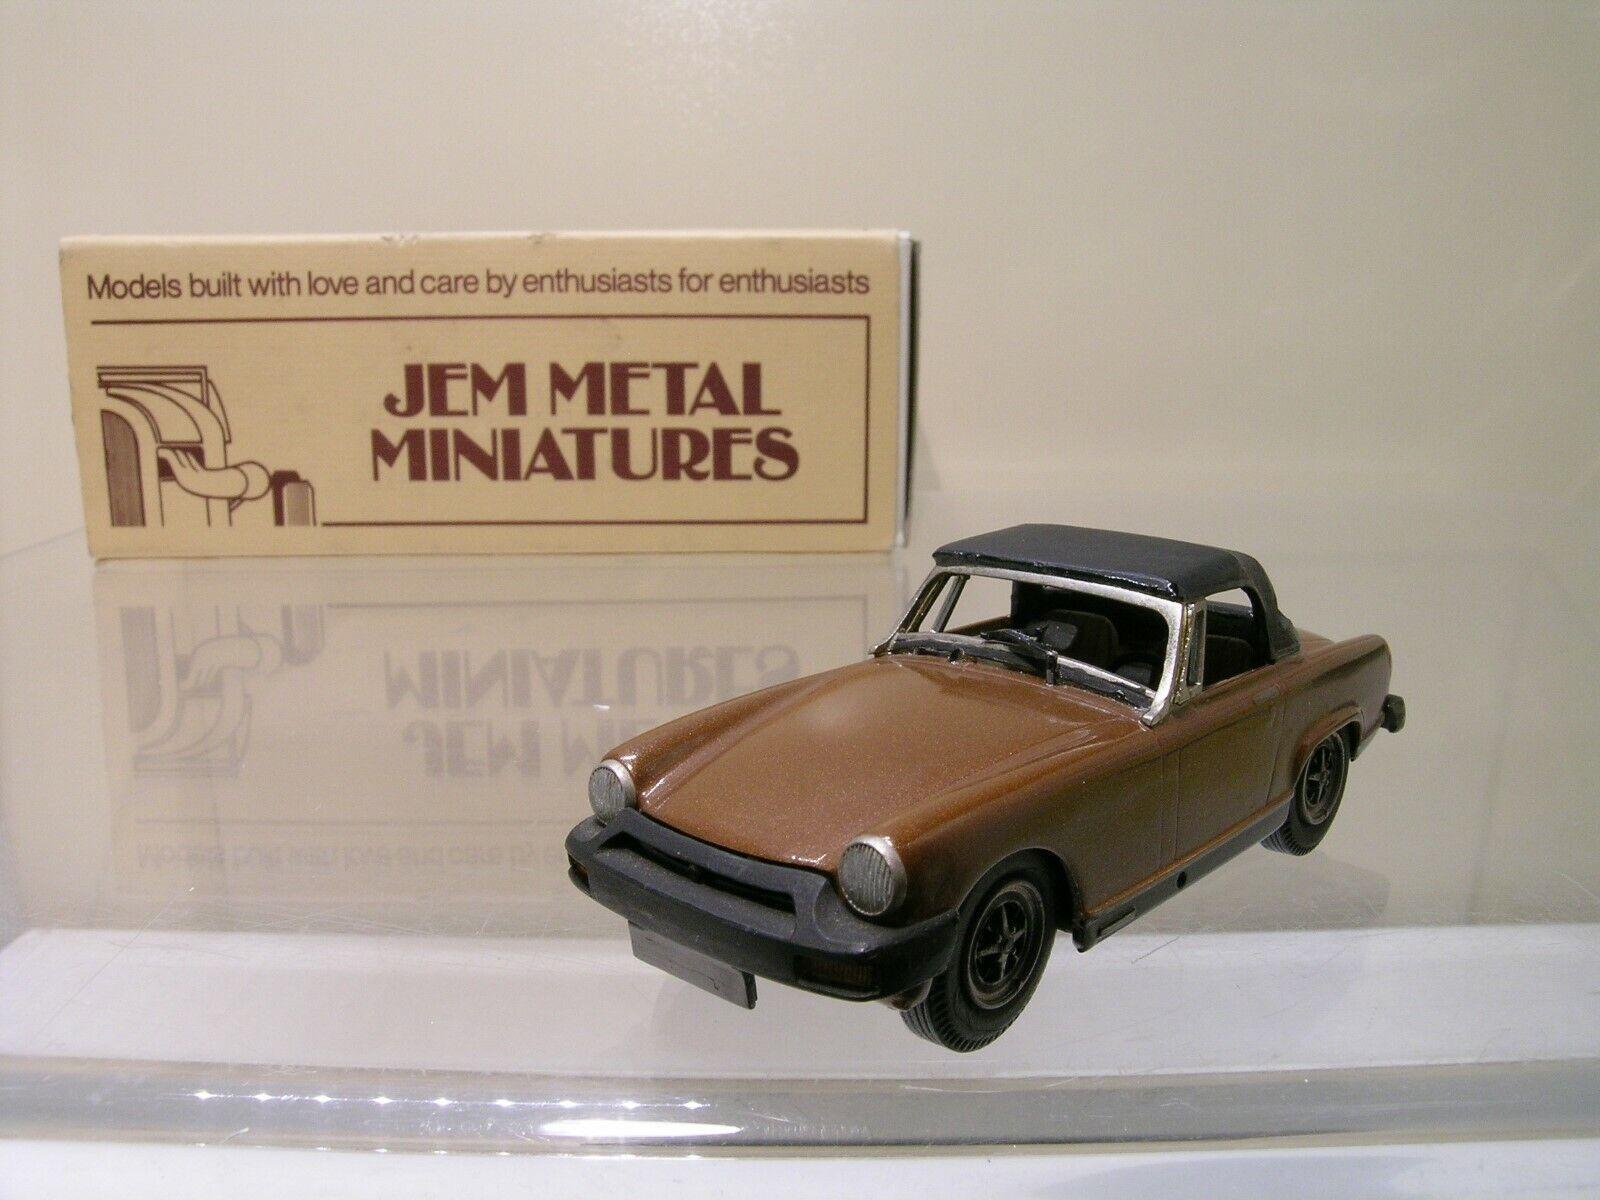 JEM METAL MINI.15 MG MIDGET RUBBER BUMPER 1975 BROWN WHITE-MET.HANDB.+BOX 1 43